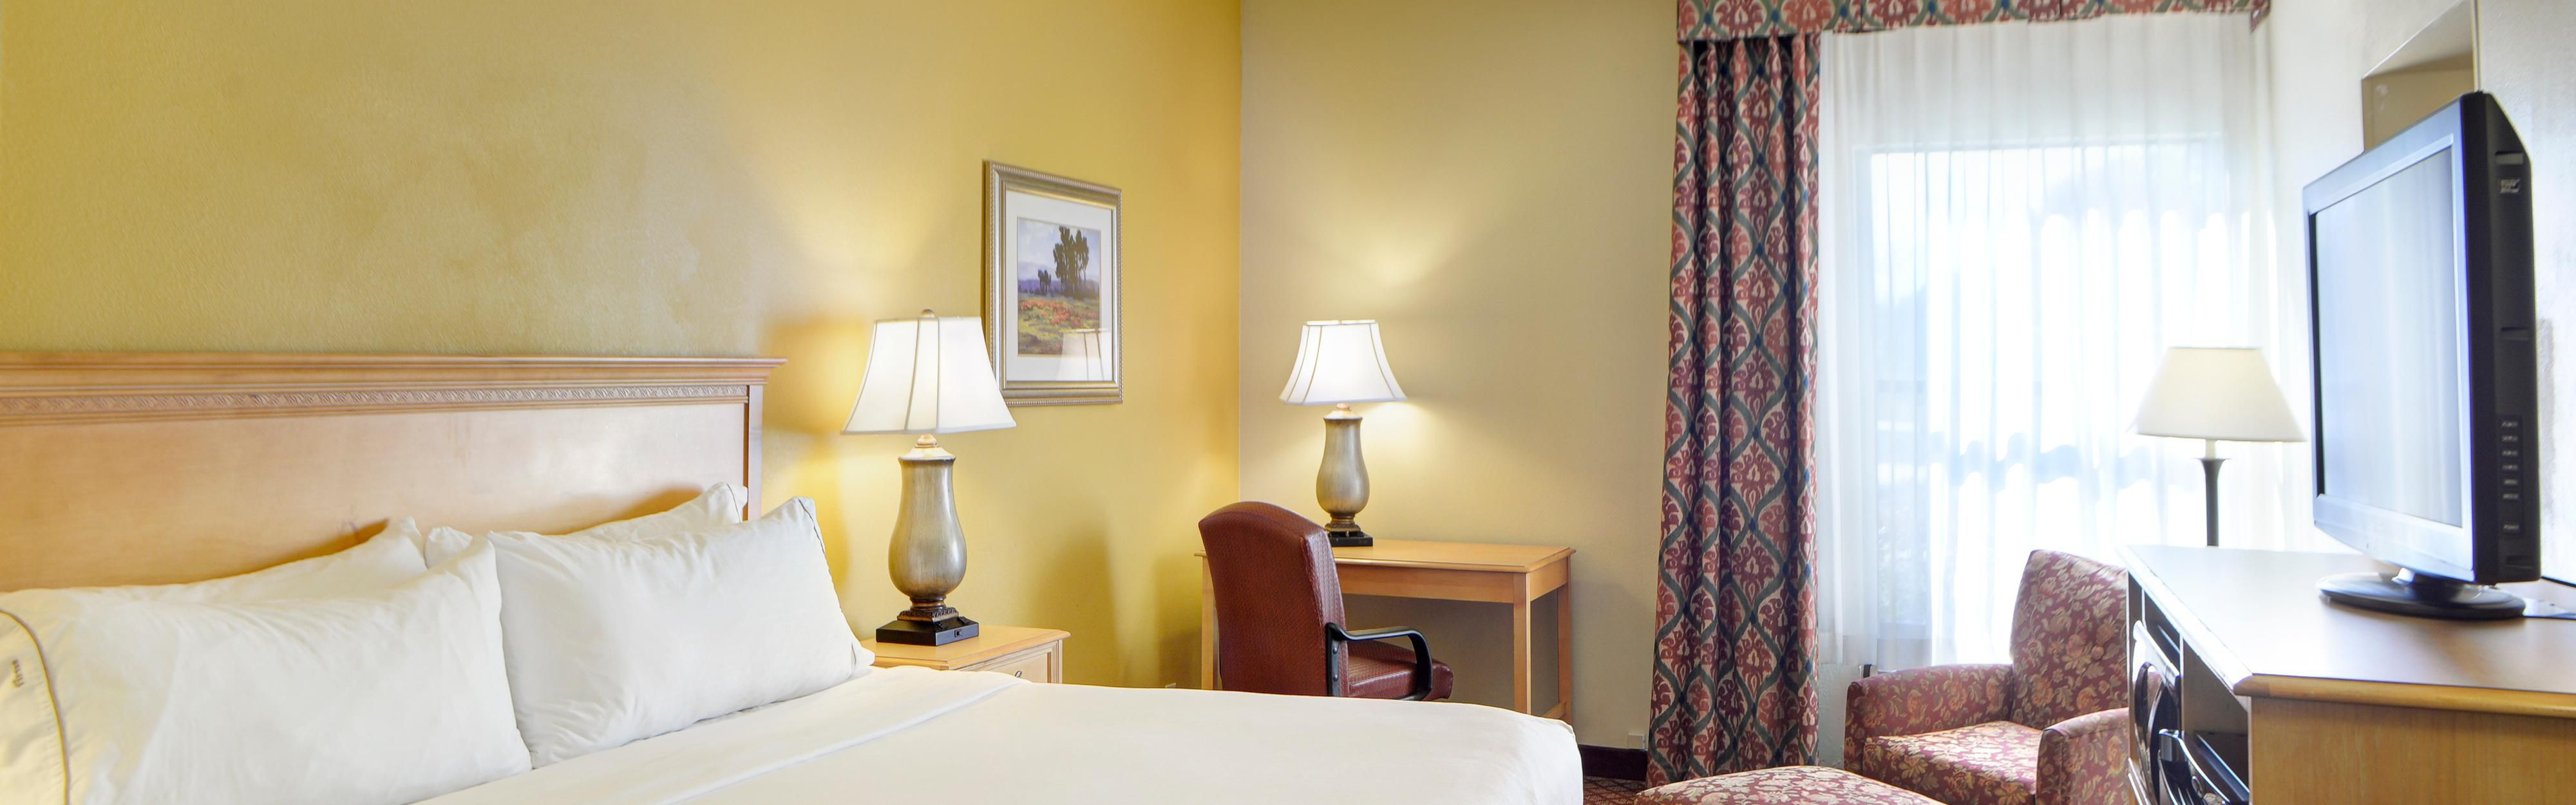 Holiday Inn Express Indianapolis South image 1